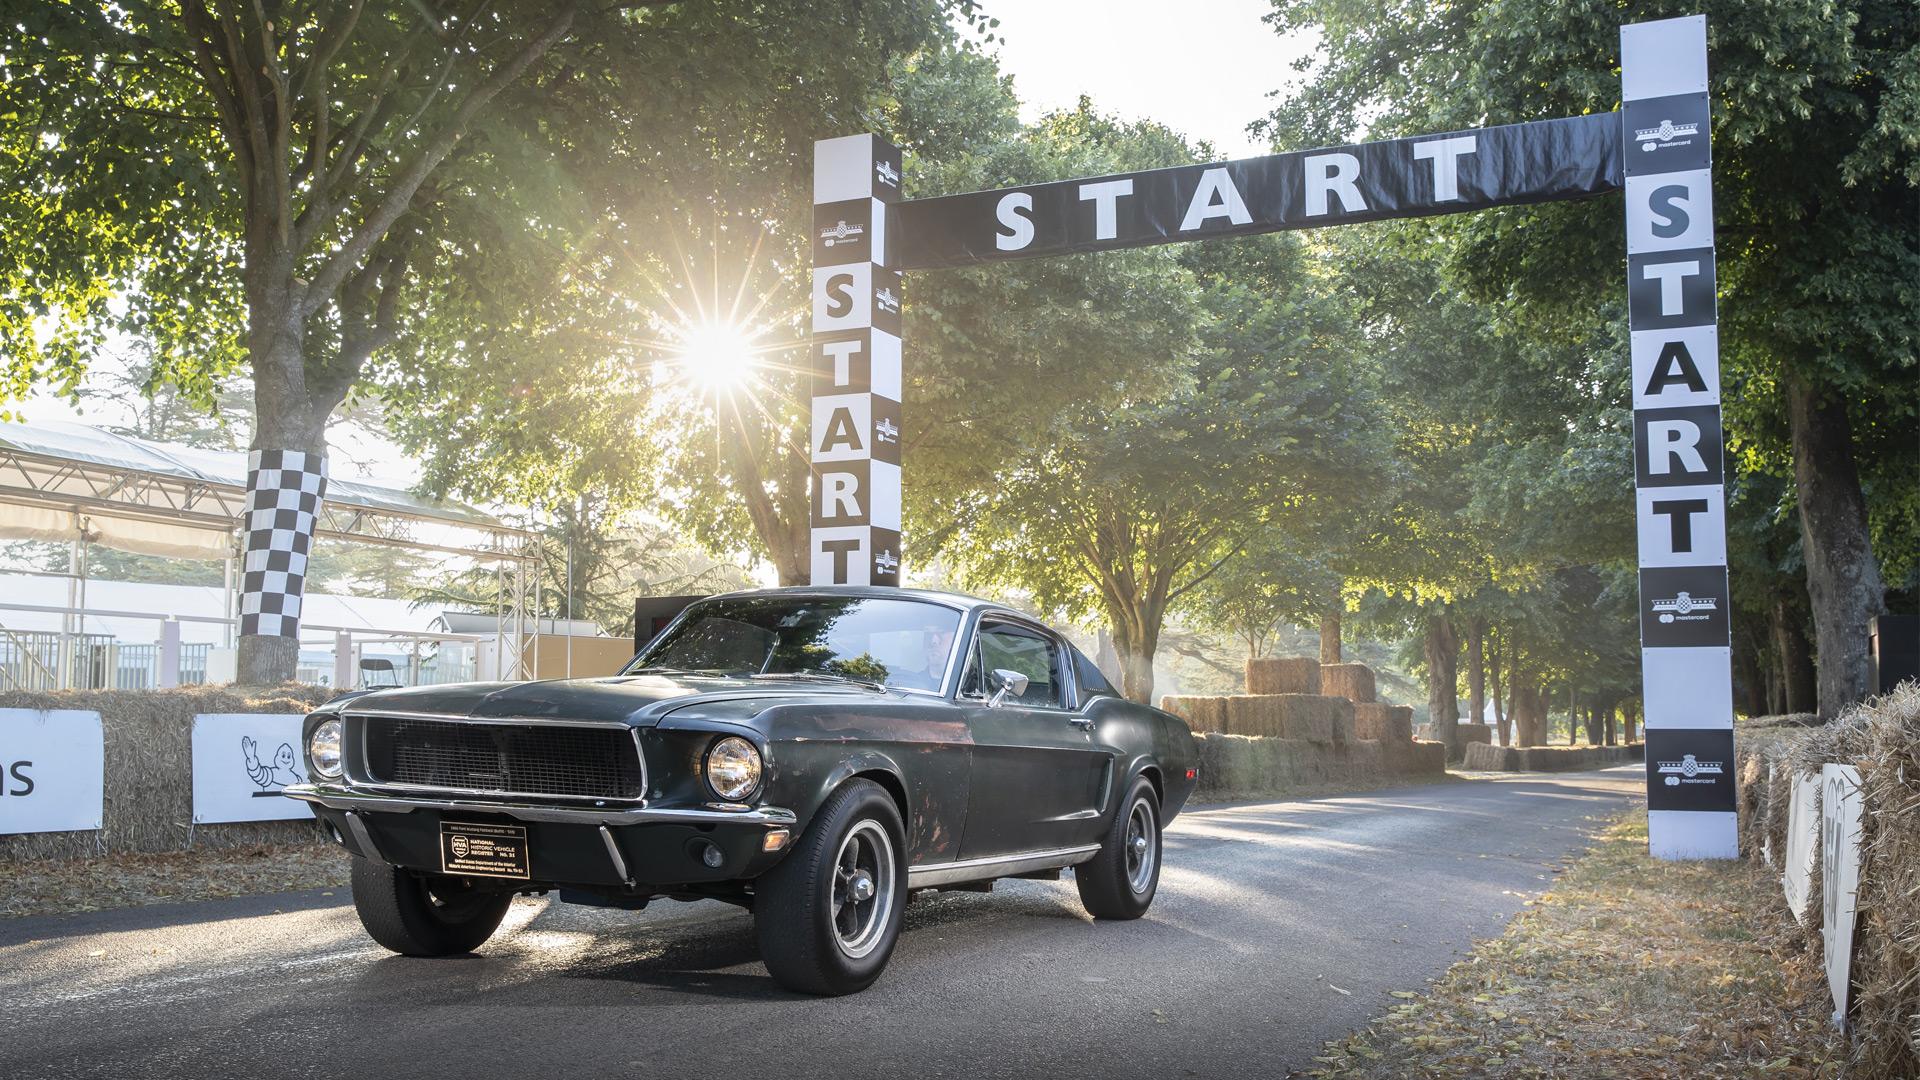 Ford Brings the Original Bullitt Mustang to Goodwood for a Battle